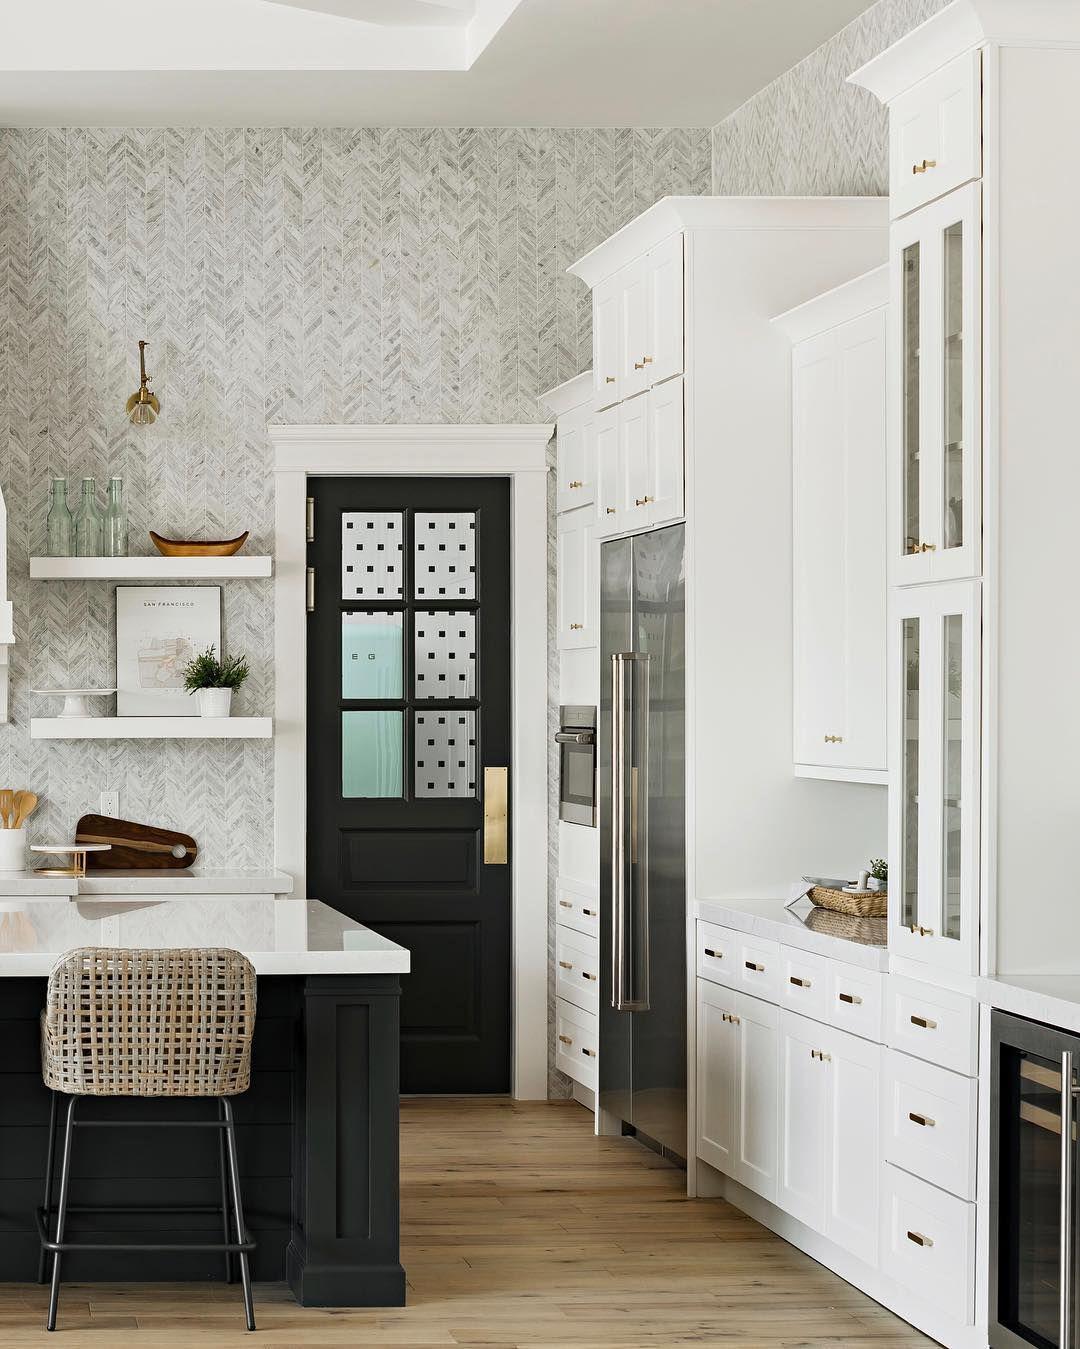 Glass door cabinets, floating shelves, and floor to ...